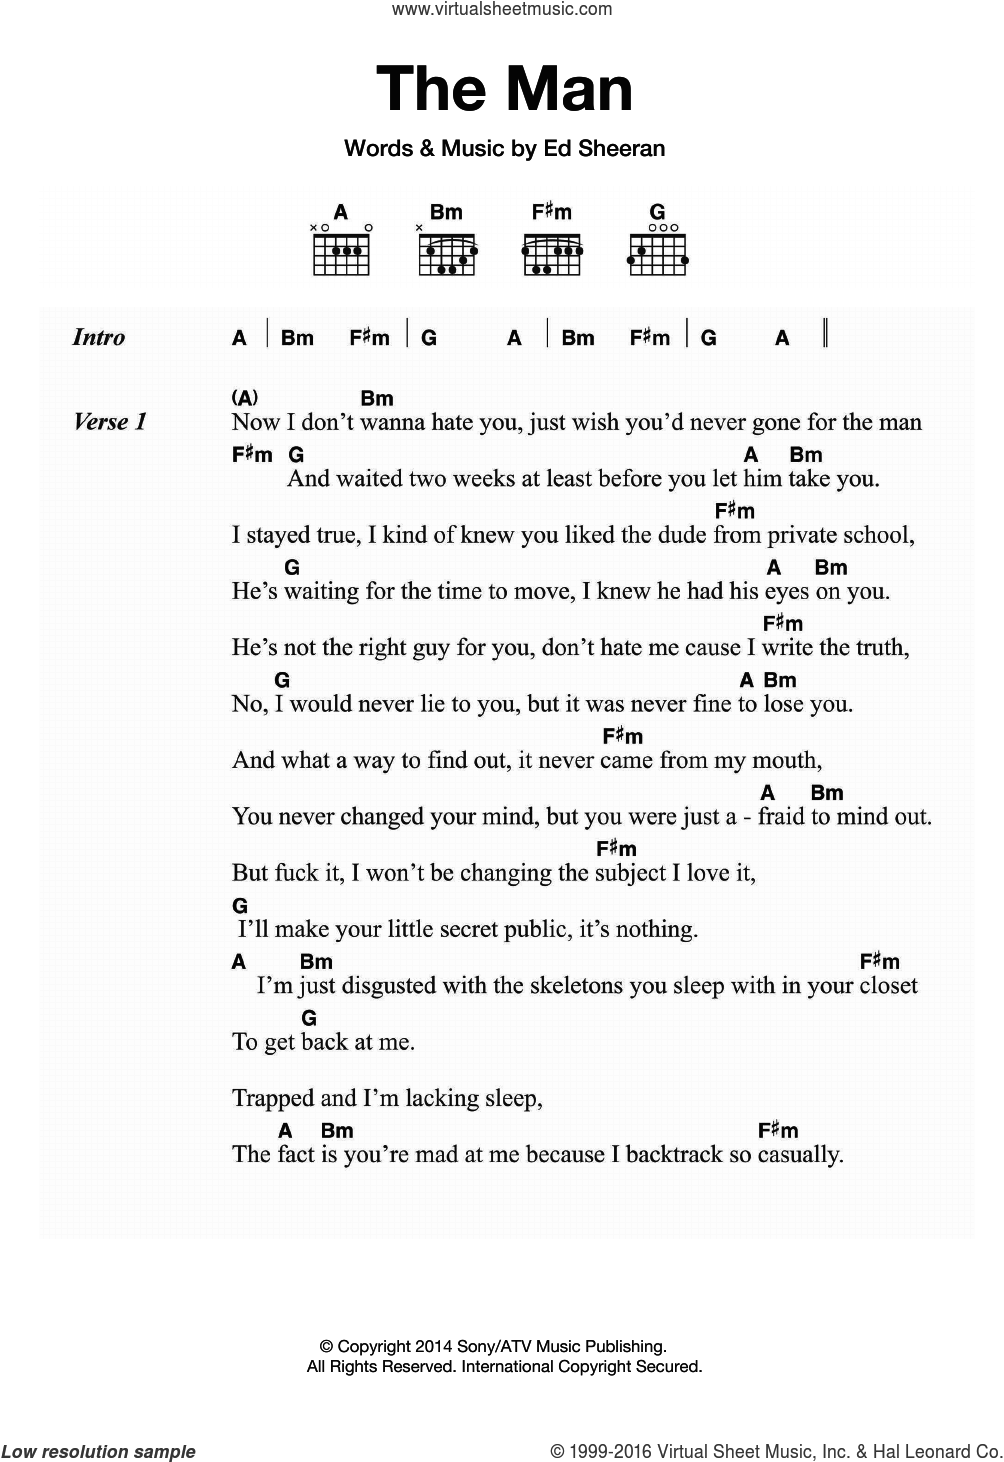 The Man sheet music for guitar (chords) by Ed Sheeran, intermediate skill level